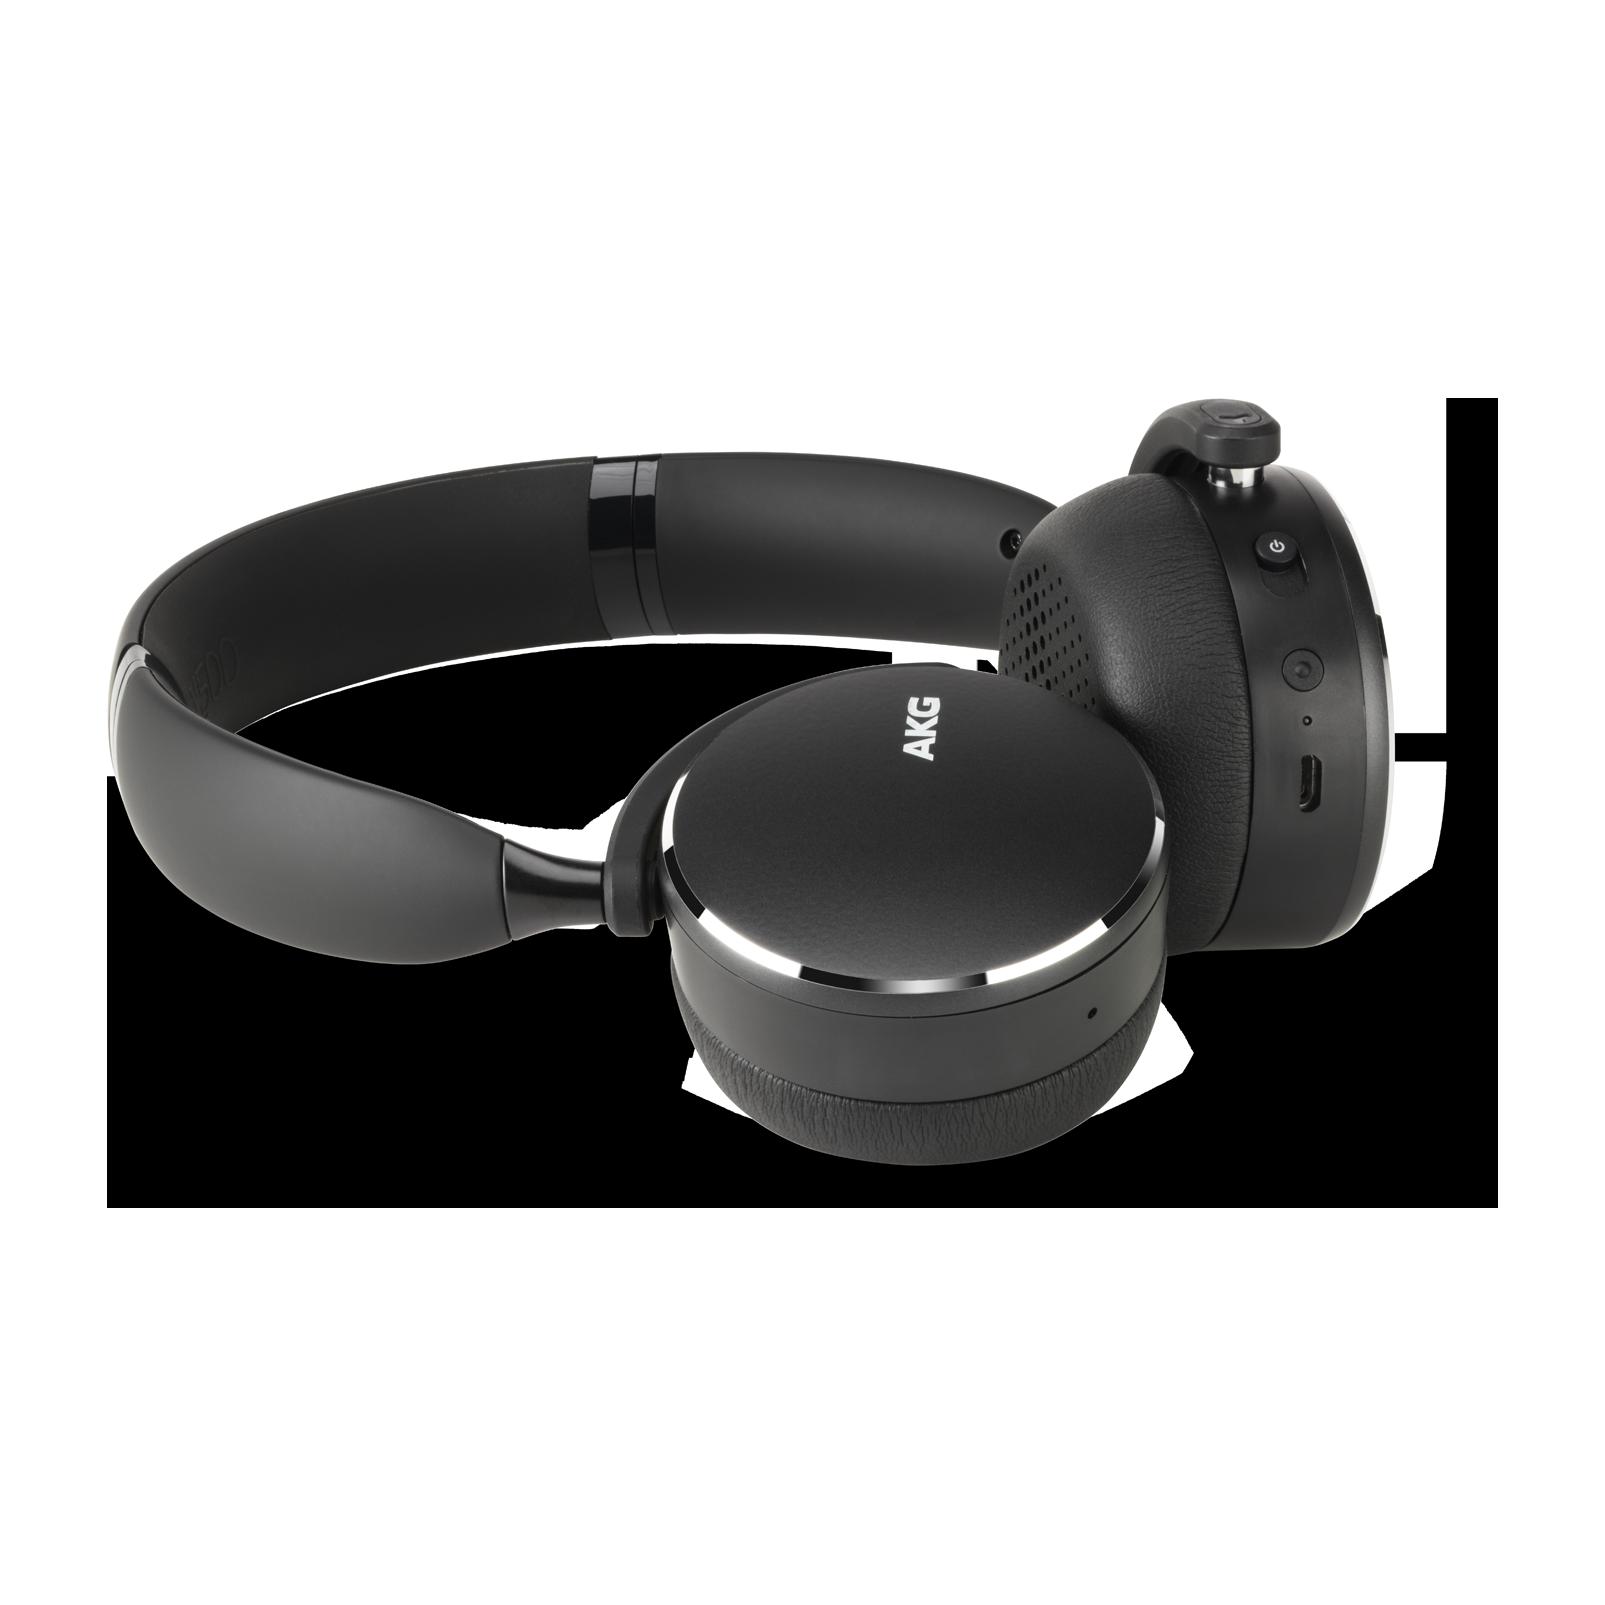 y500 wireless kabelloser on ear kopfh rer. Black Bedroom Furniture Sets. Home Design Ideas